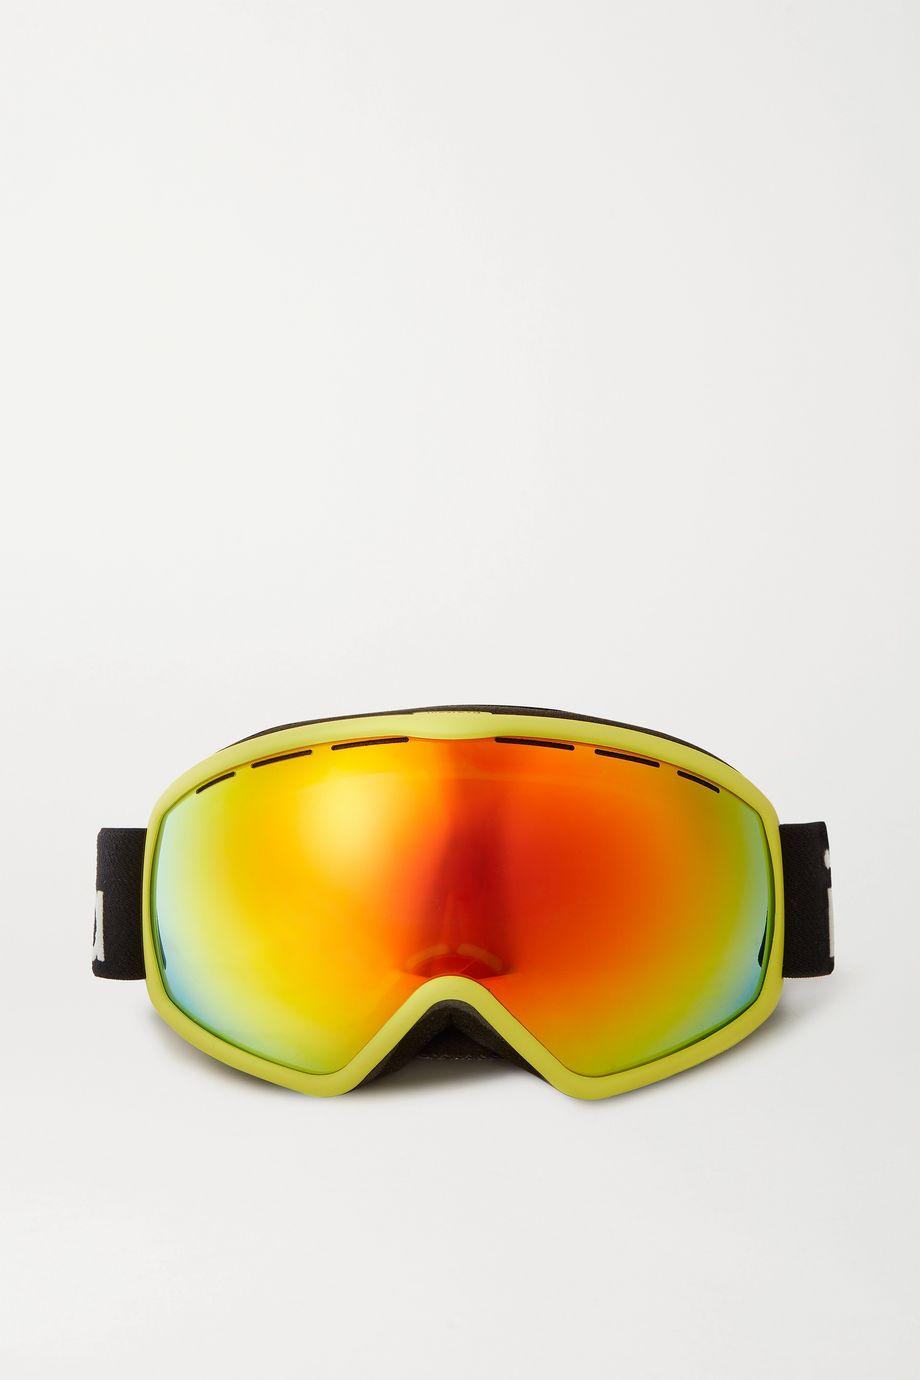 Illesteva Mirrored ski goggles